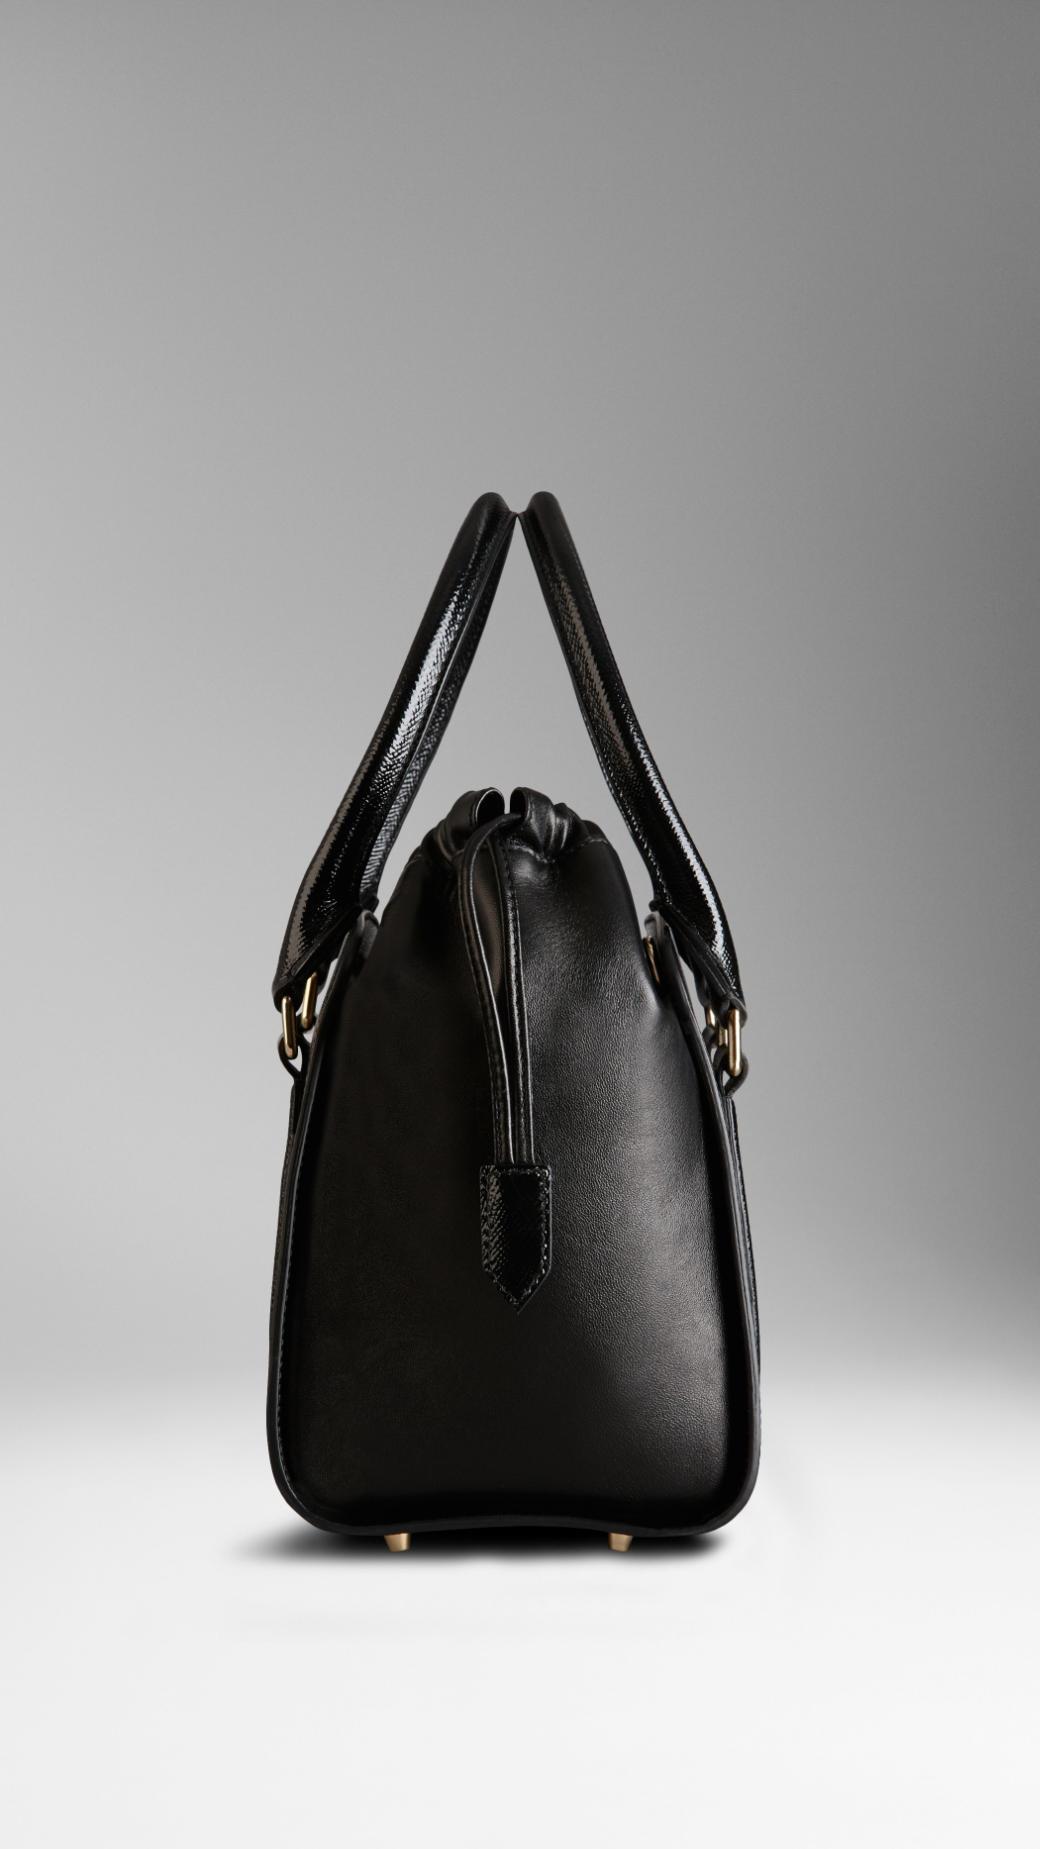 d446e6bca49e4 Lyst - Burberry Small Patent London Leather Tote Bag in Black